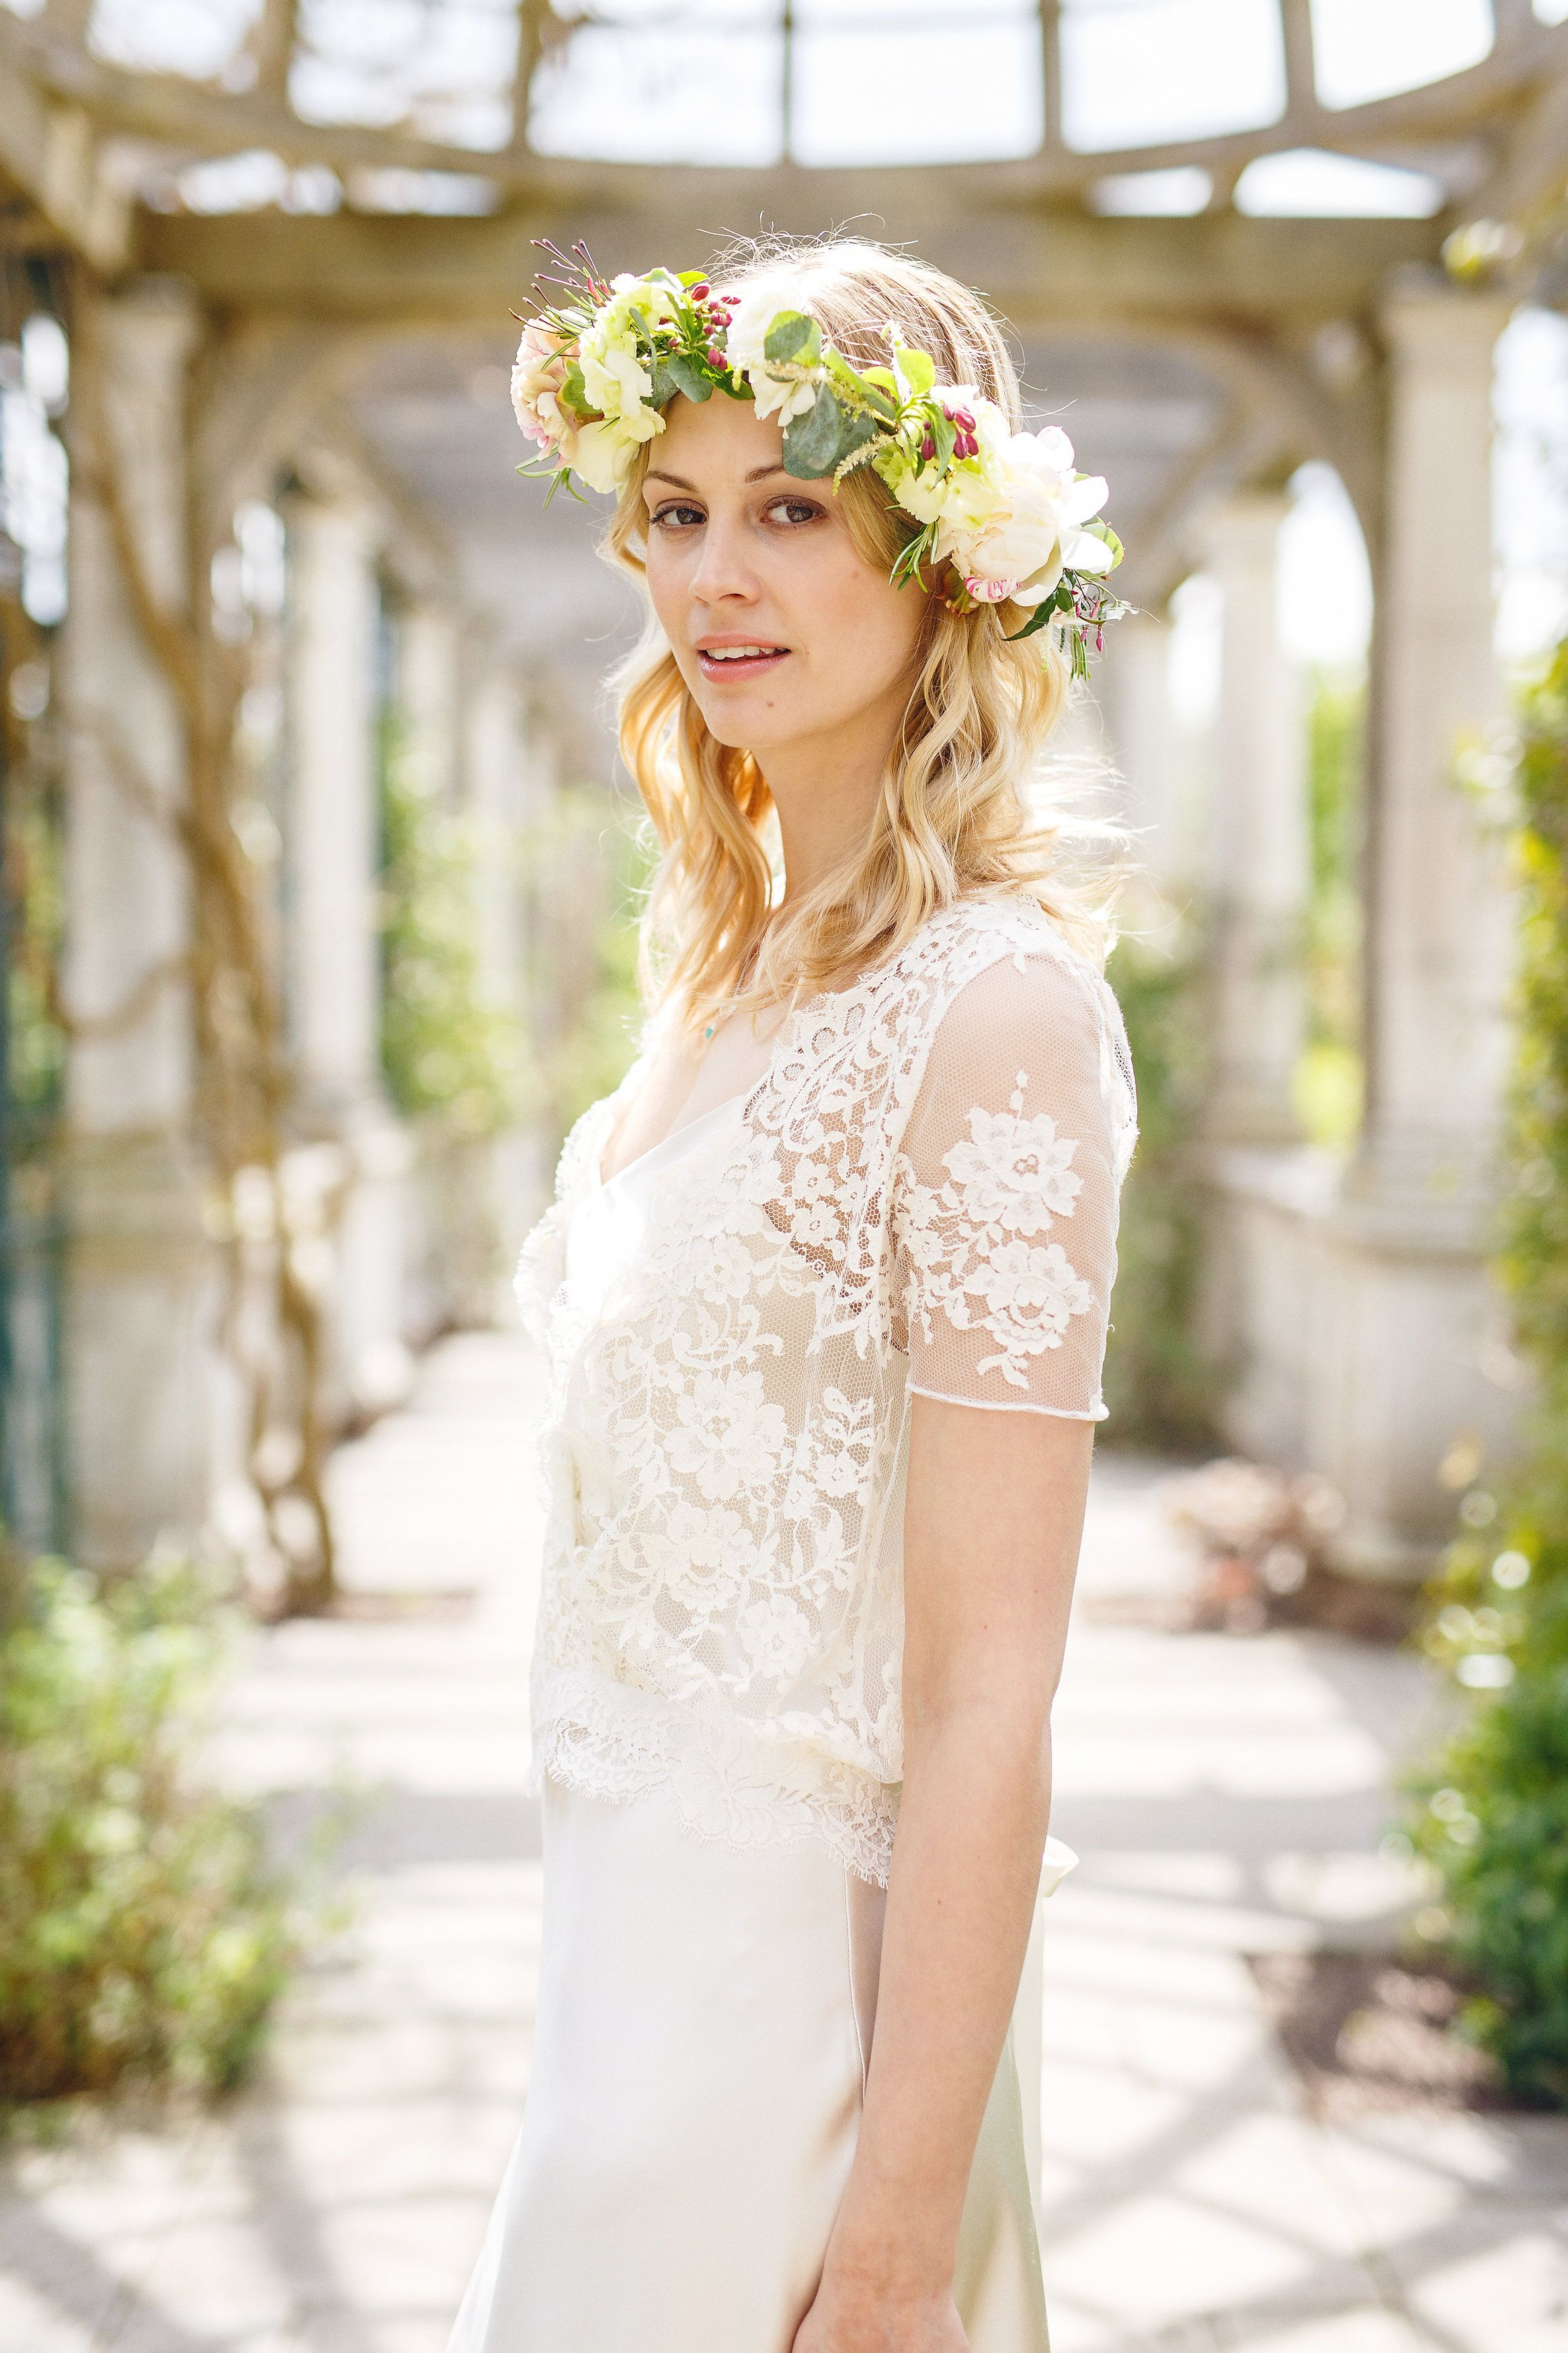 Lace boho wedding dress Designer wedding dresses, Boho